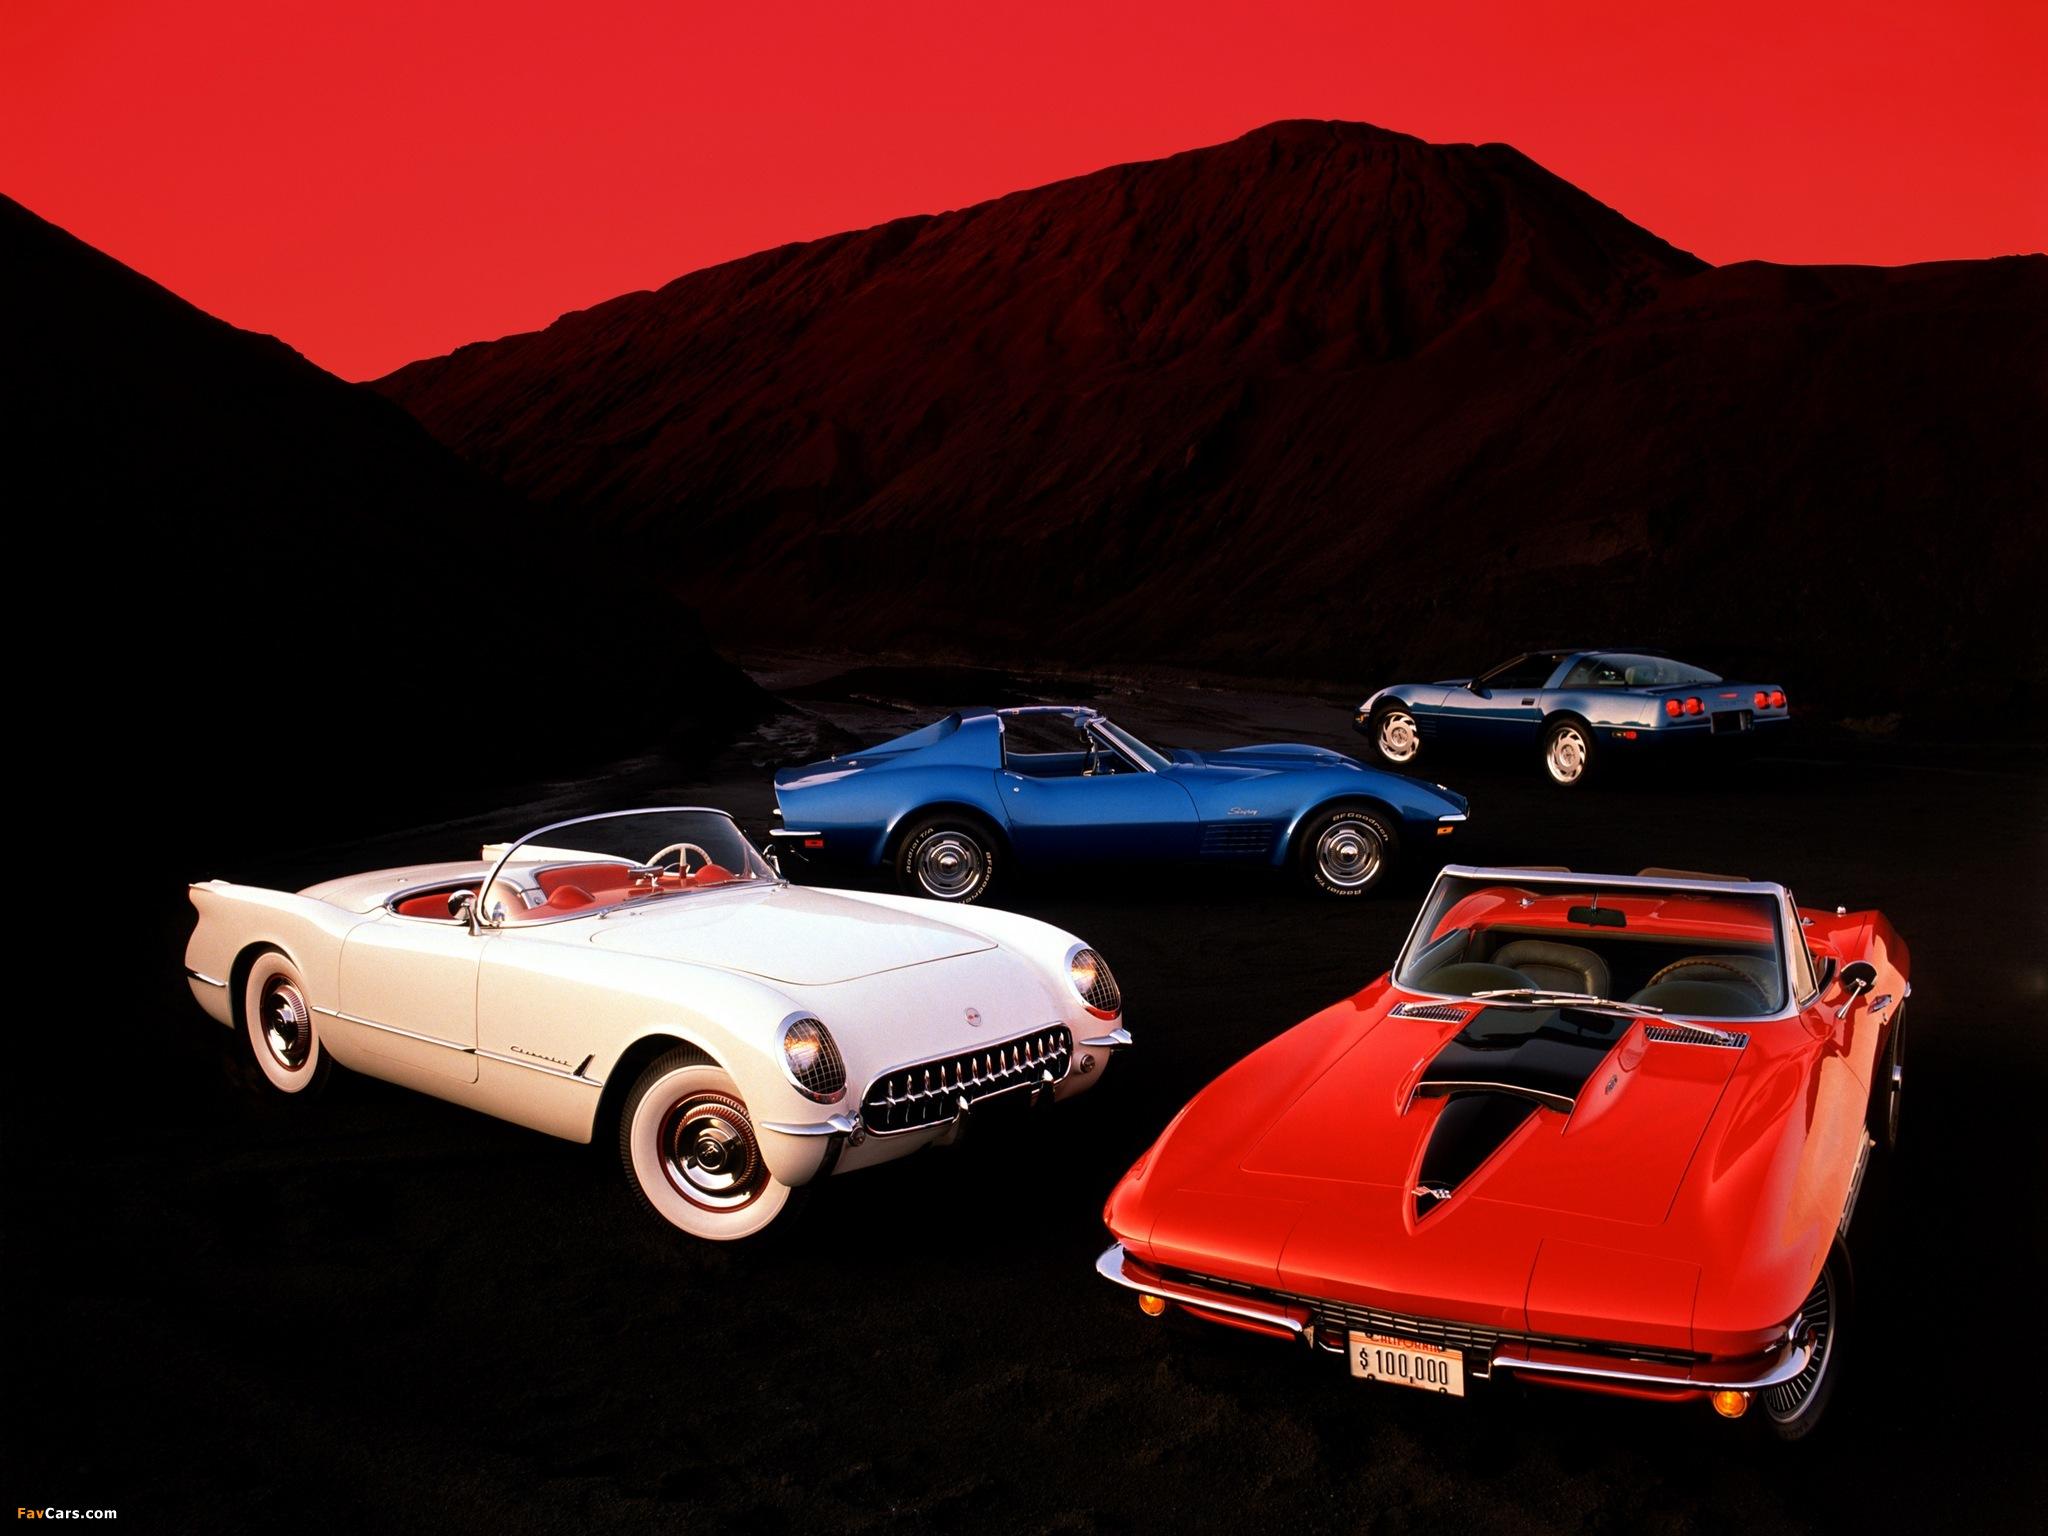 Corvette wallpapers (2048 x 1536)